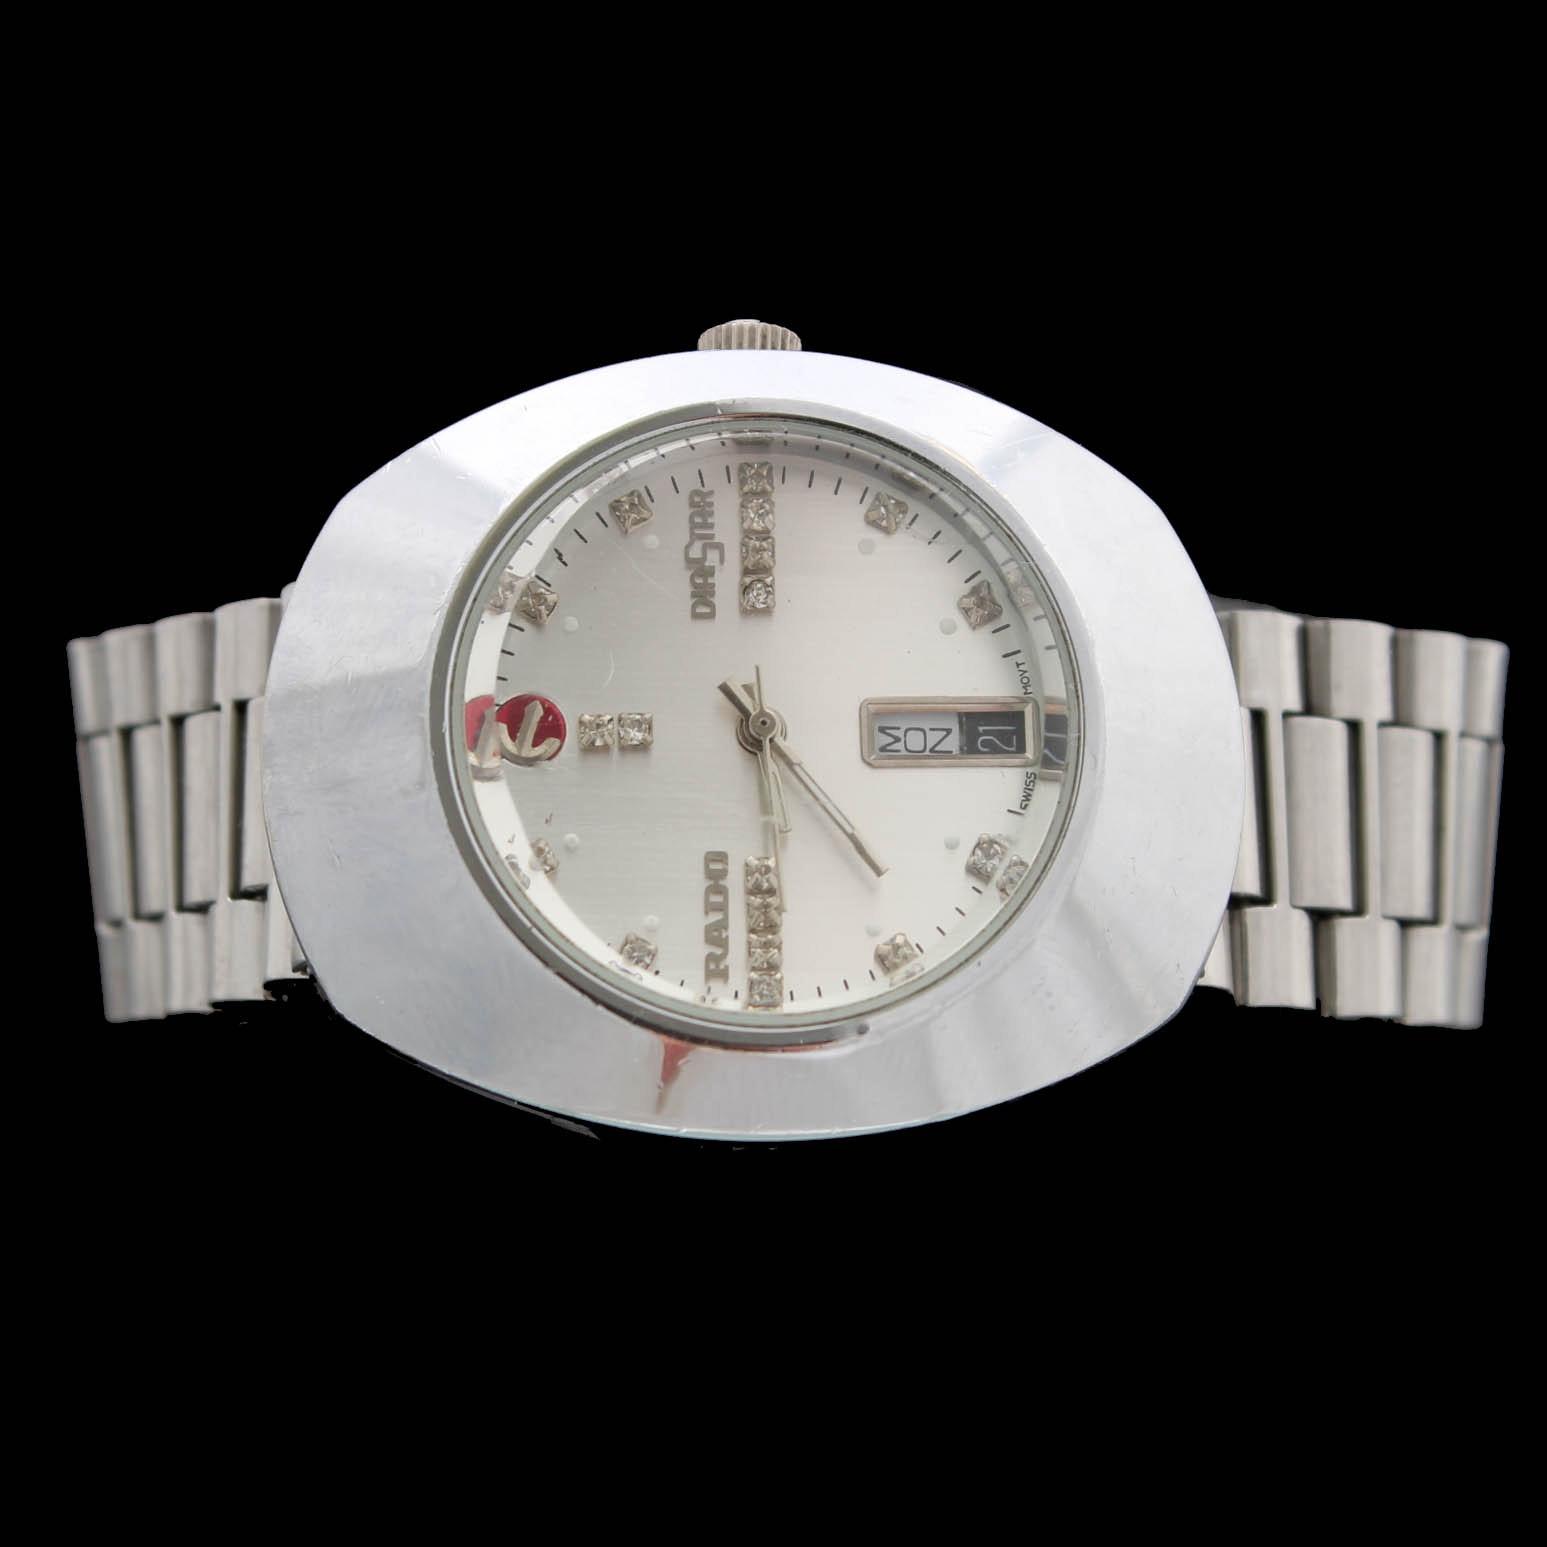 Vintage Rado Diastar Swiss Quartz Stainless Steel Wristwatch